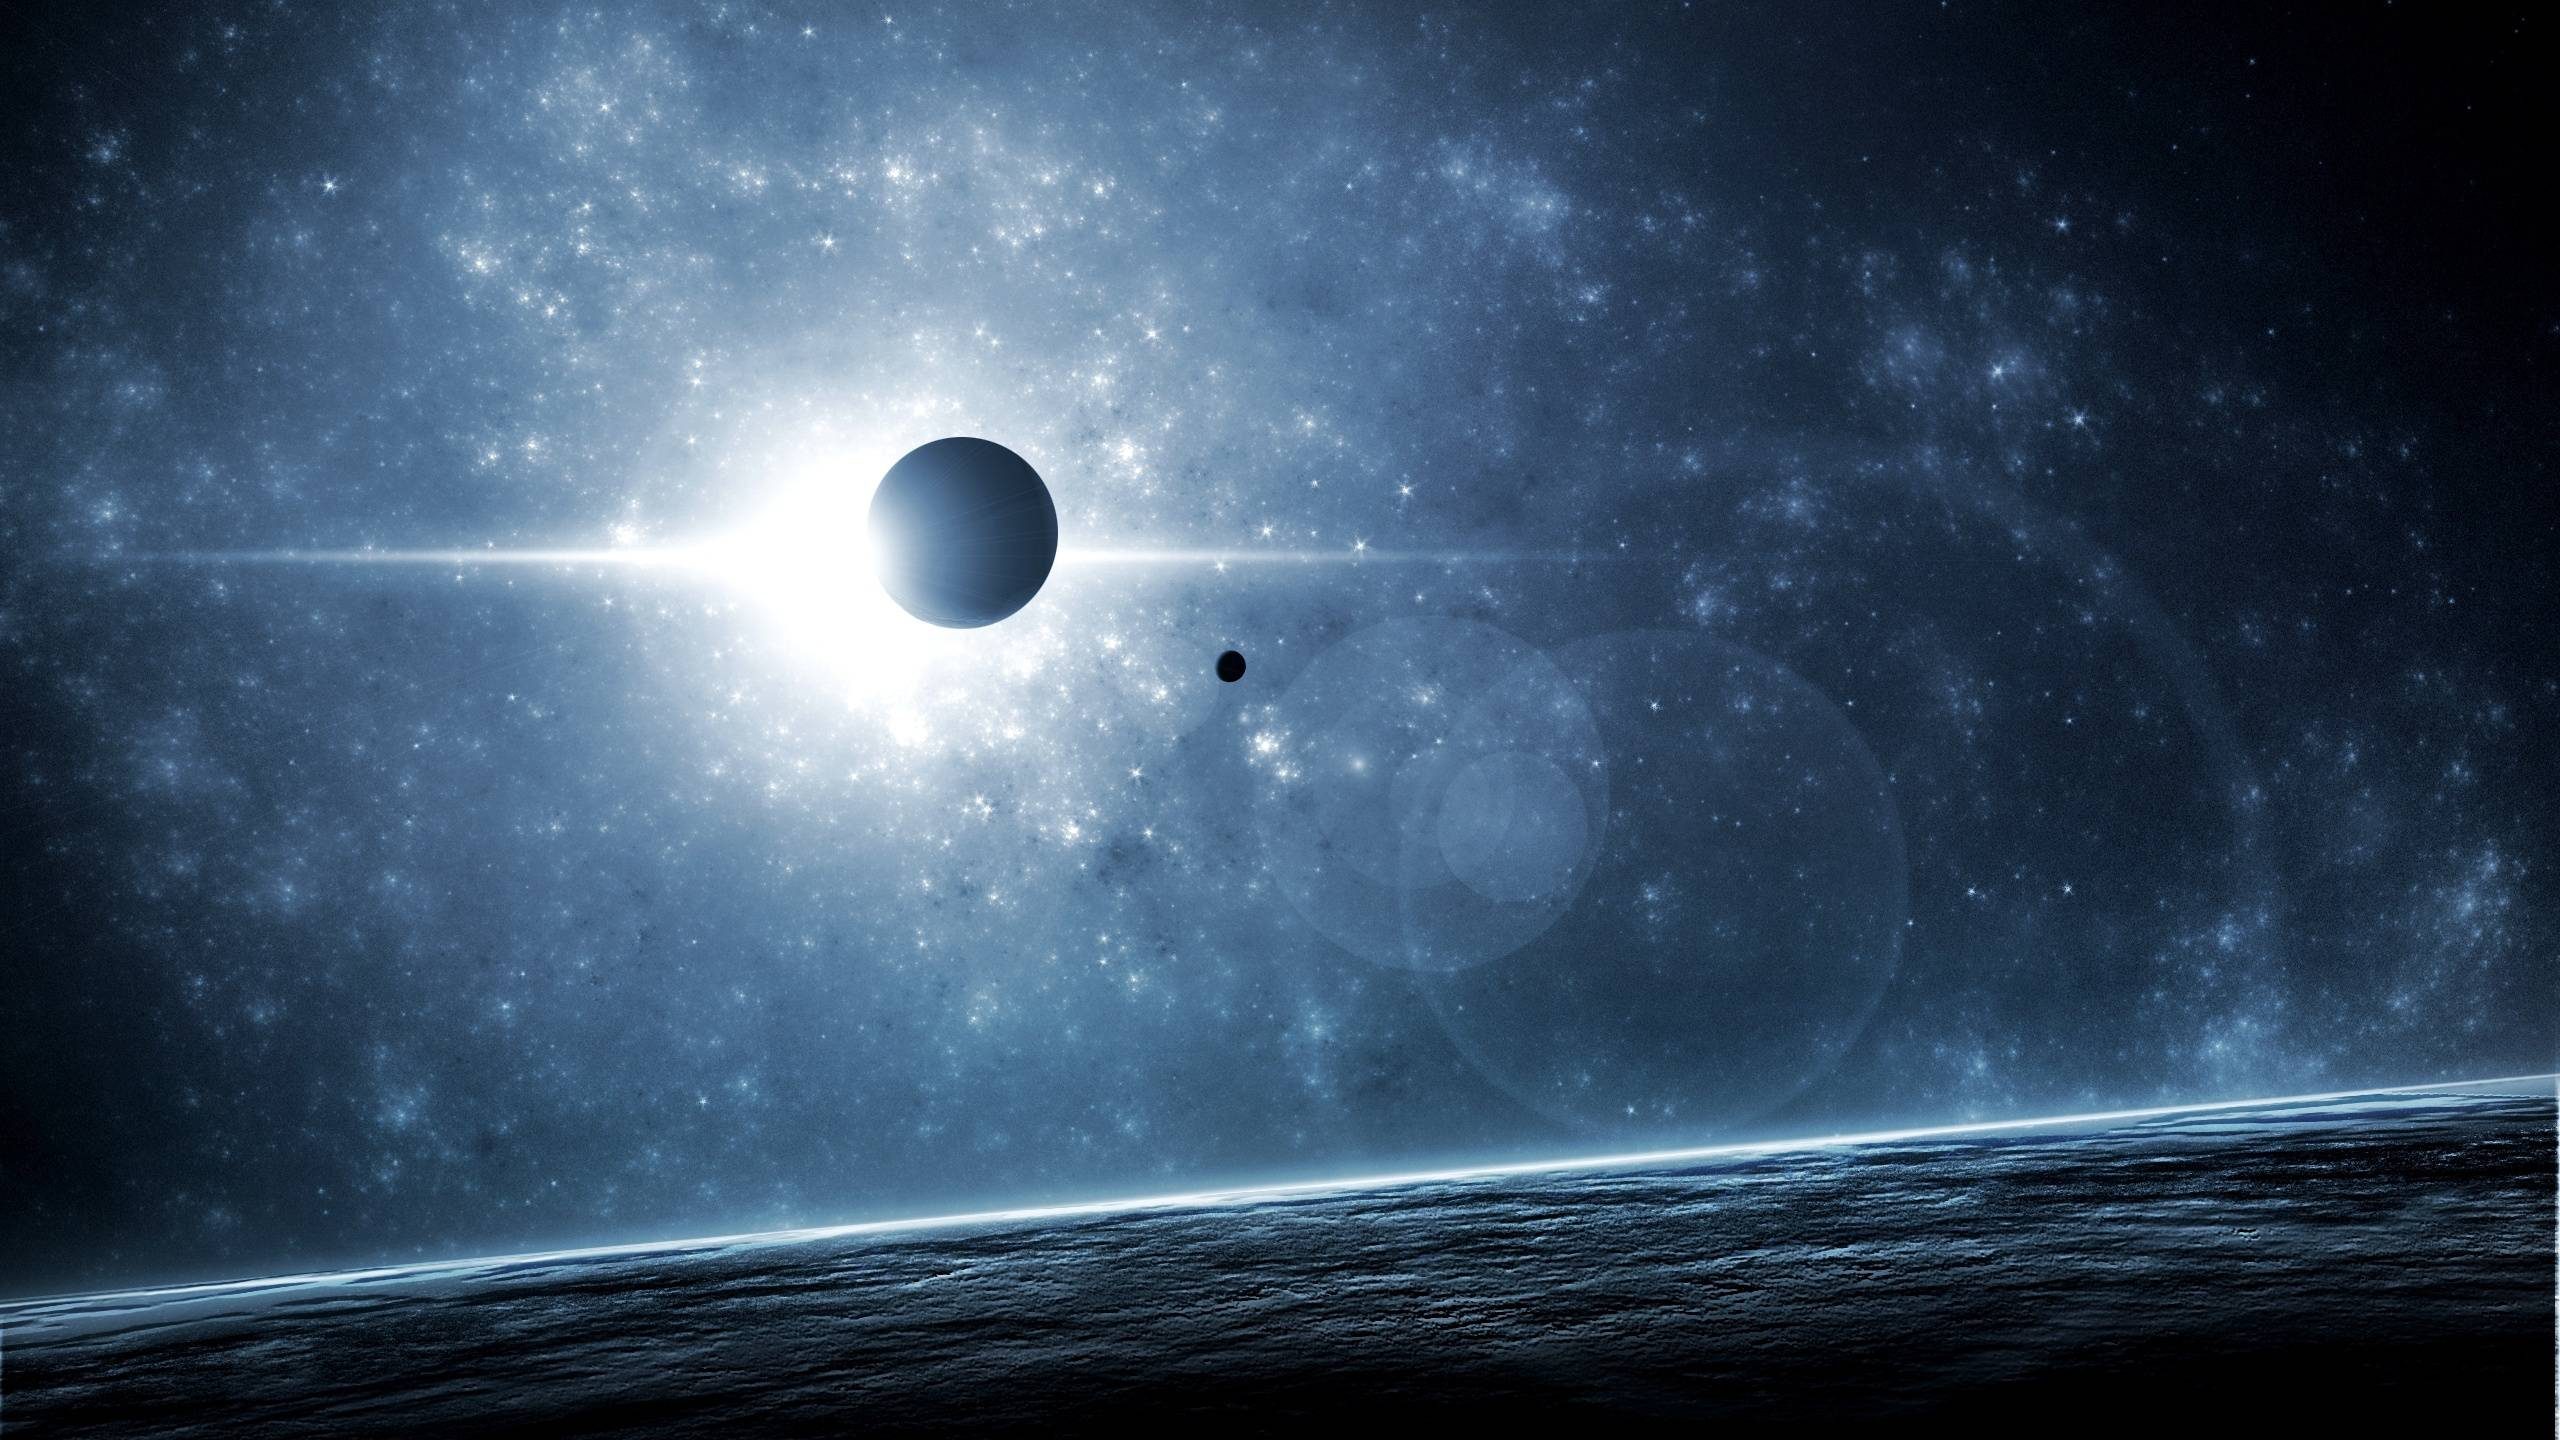 Planet Eclipse Tiny Distant Solar Lunar hd wallpaper #